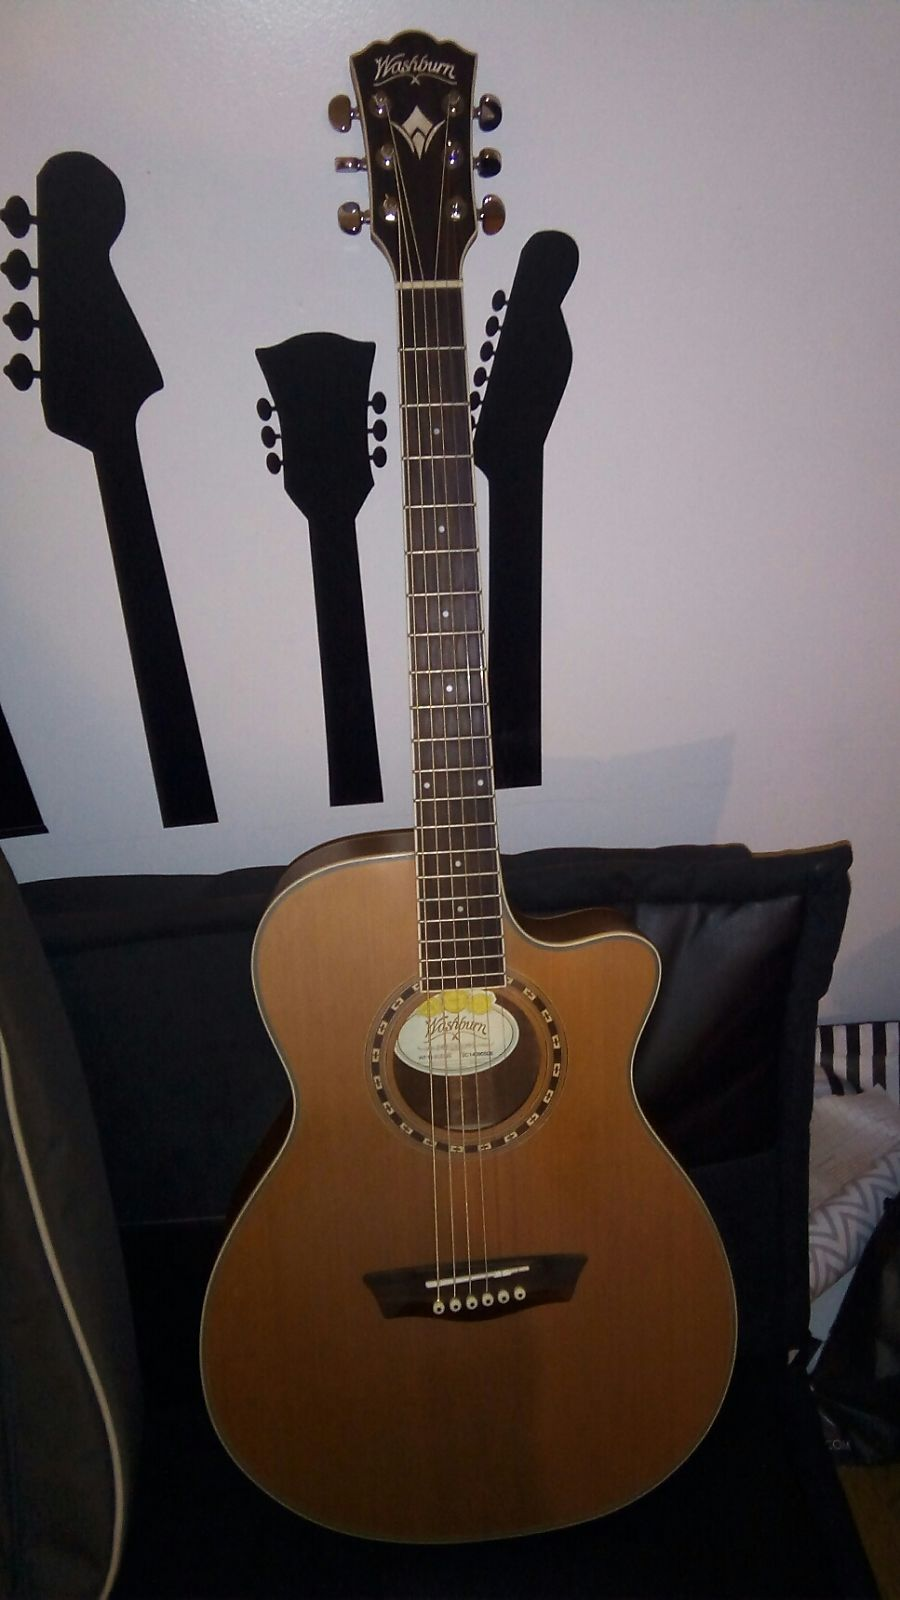 Washburn wf11s cedar mahogany folk natural reverb for Motor city guitar waterford